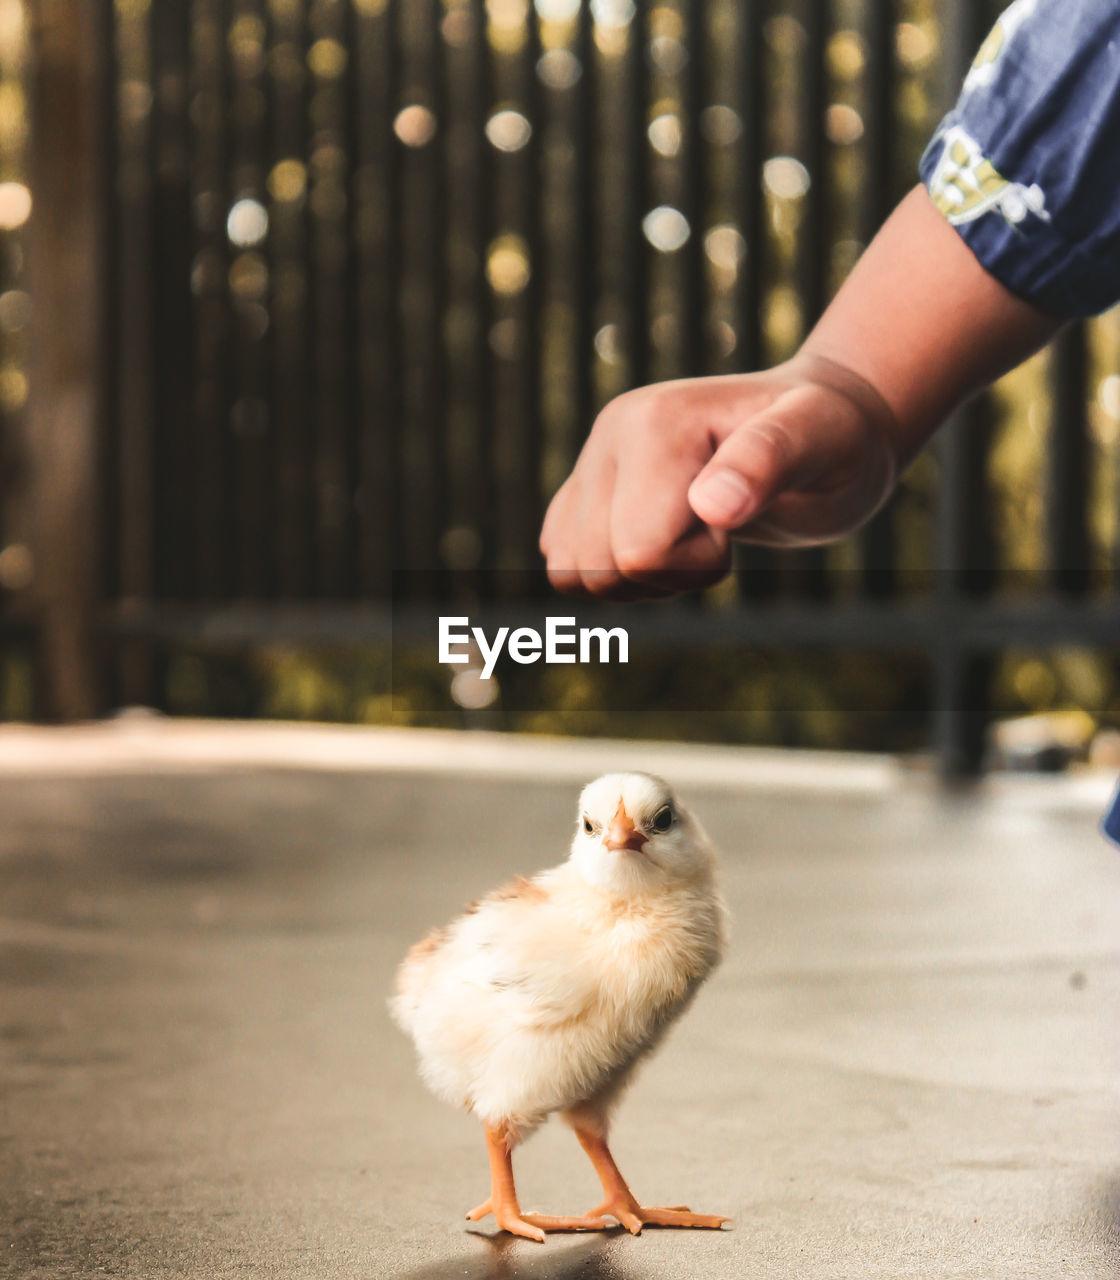 Full length of hand holding bird against blurred background